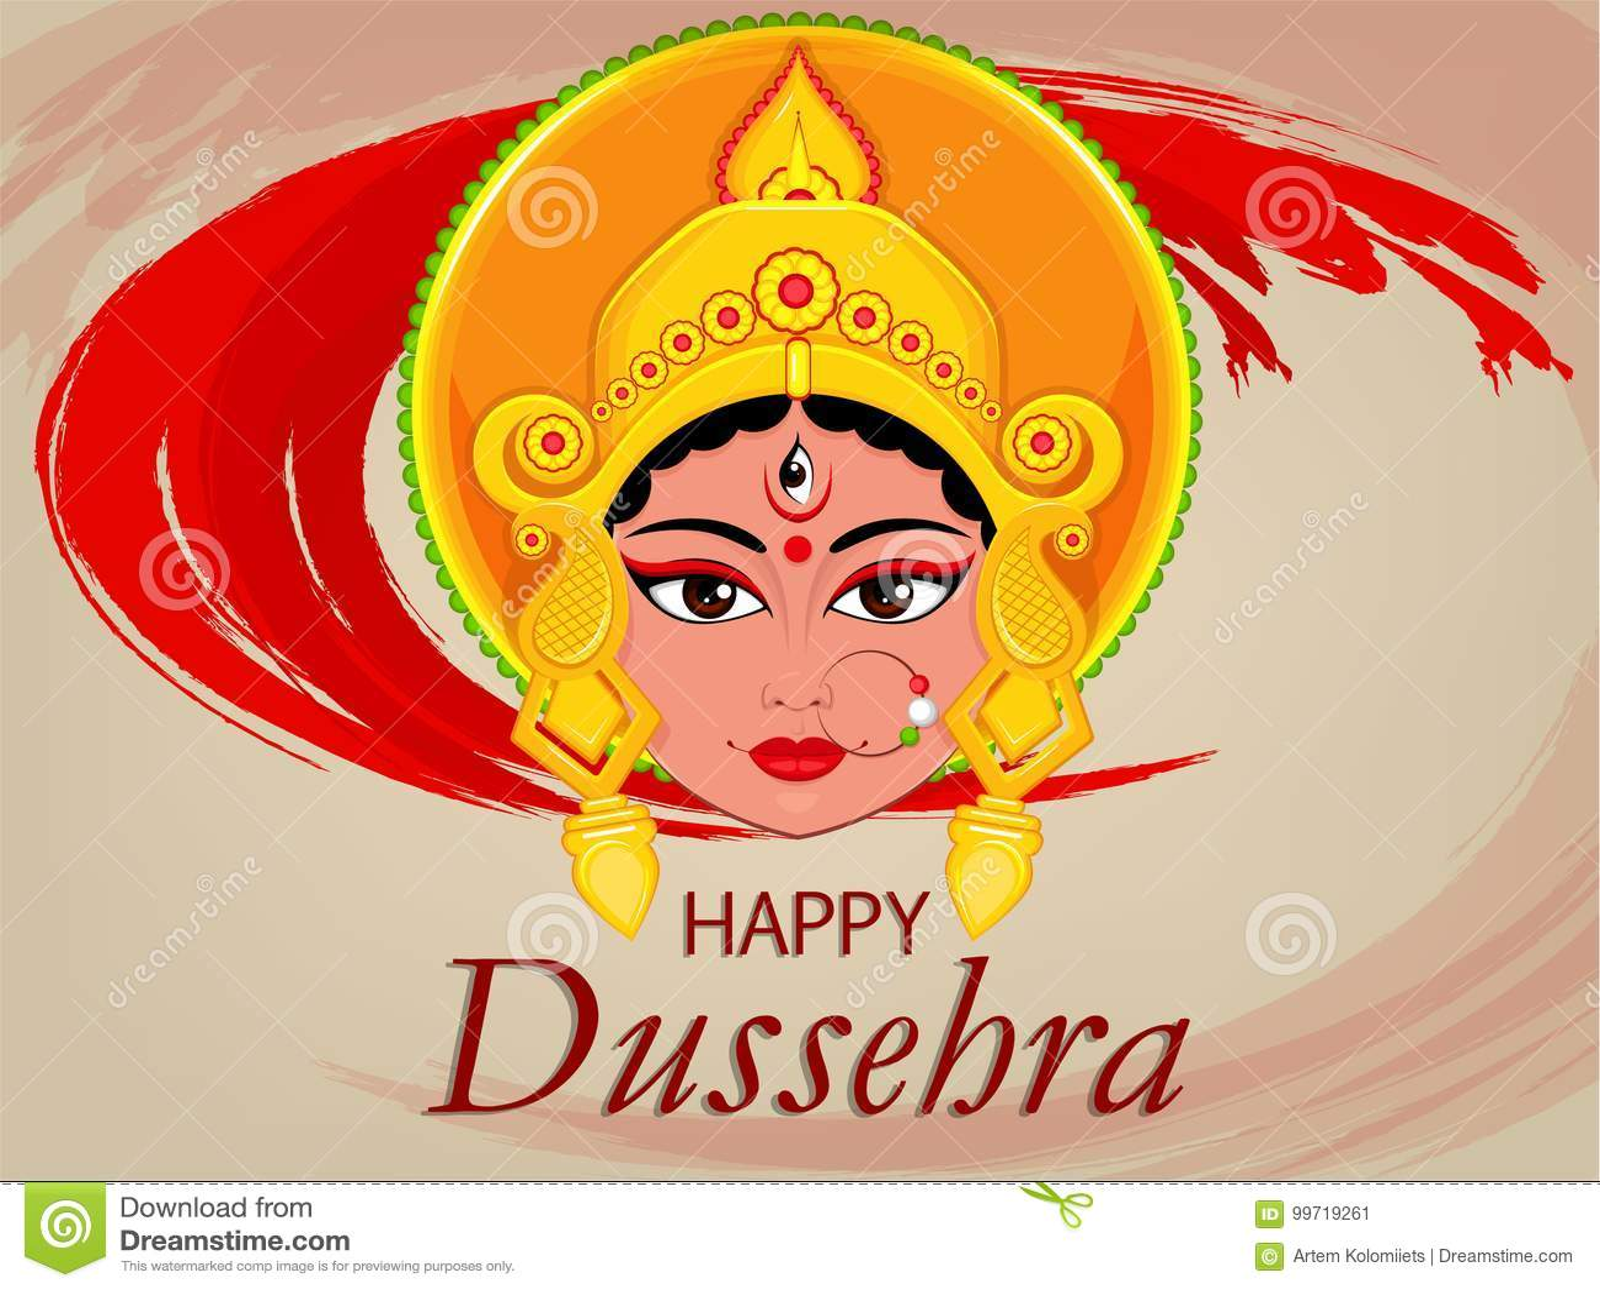 Happy Dussehra Greeting Card Maa Durga Face For Hindu Festival